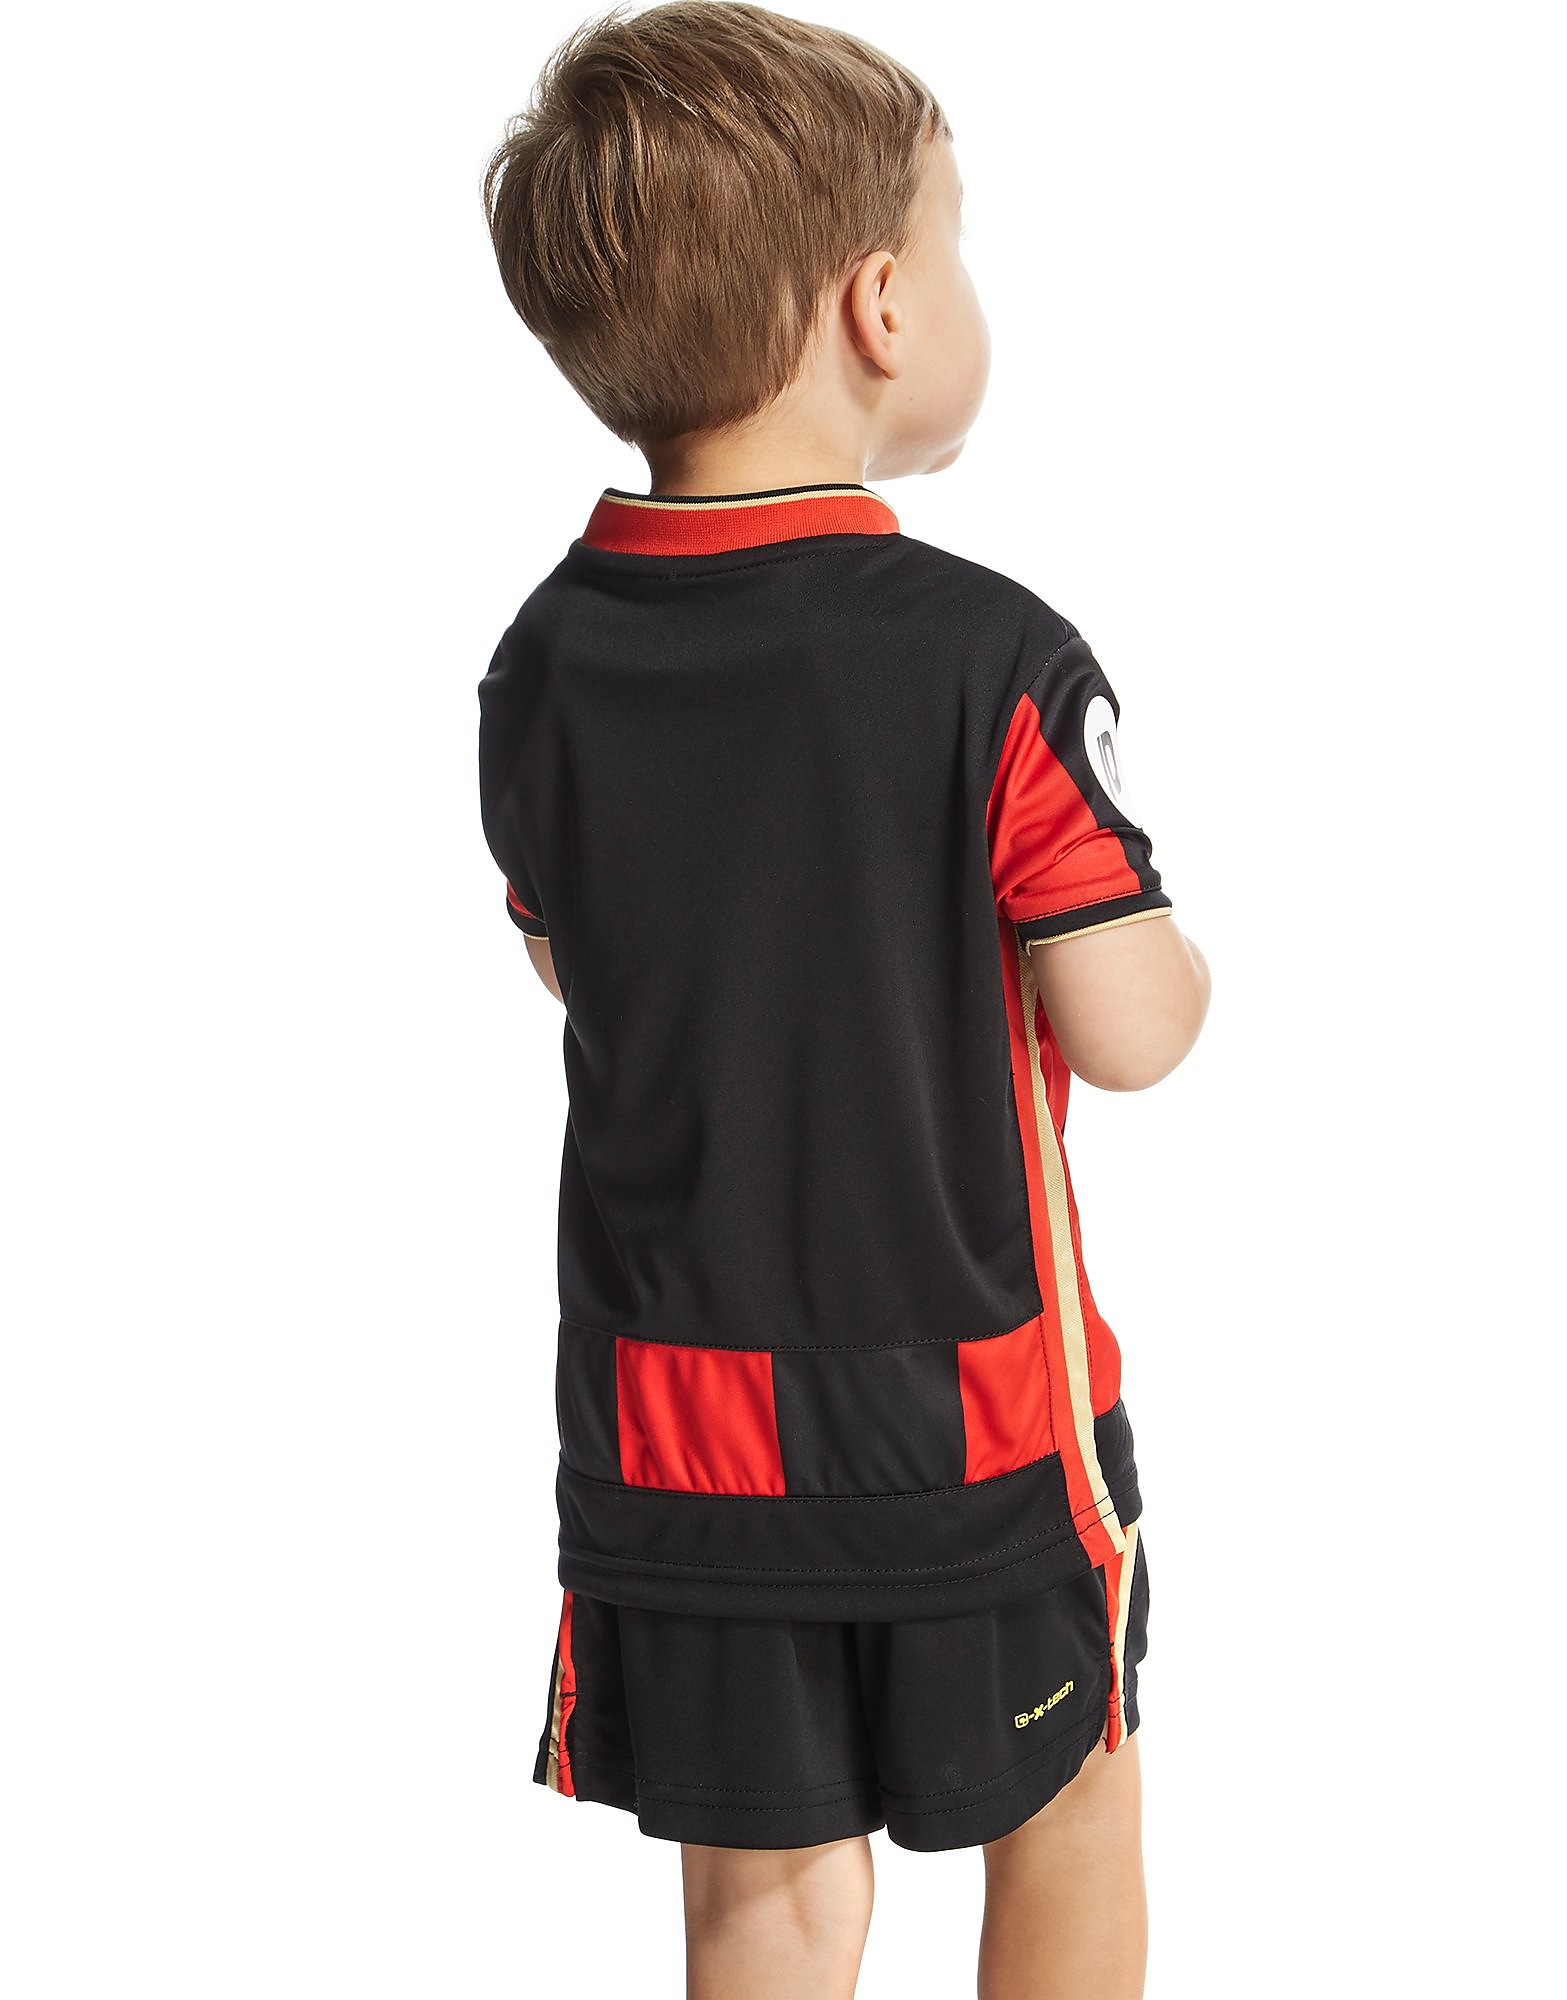 JD AFC Bournemouth Home 2015/16 Kit Infant